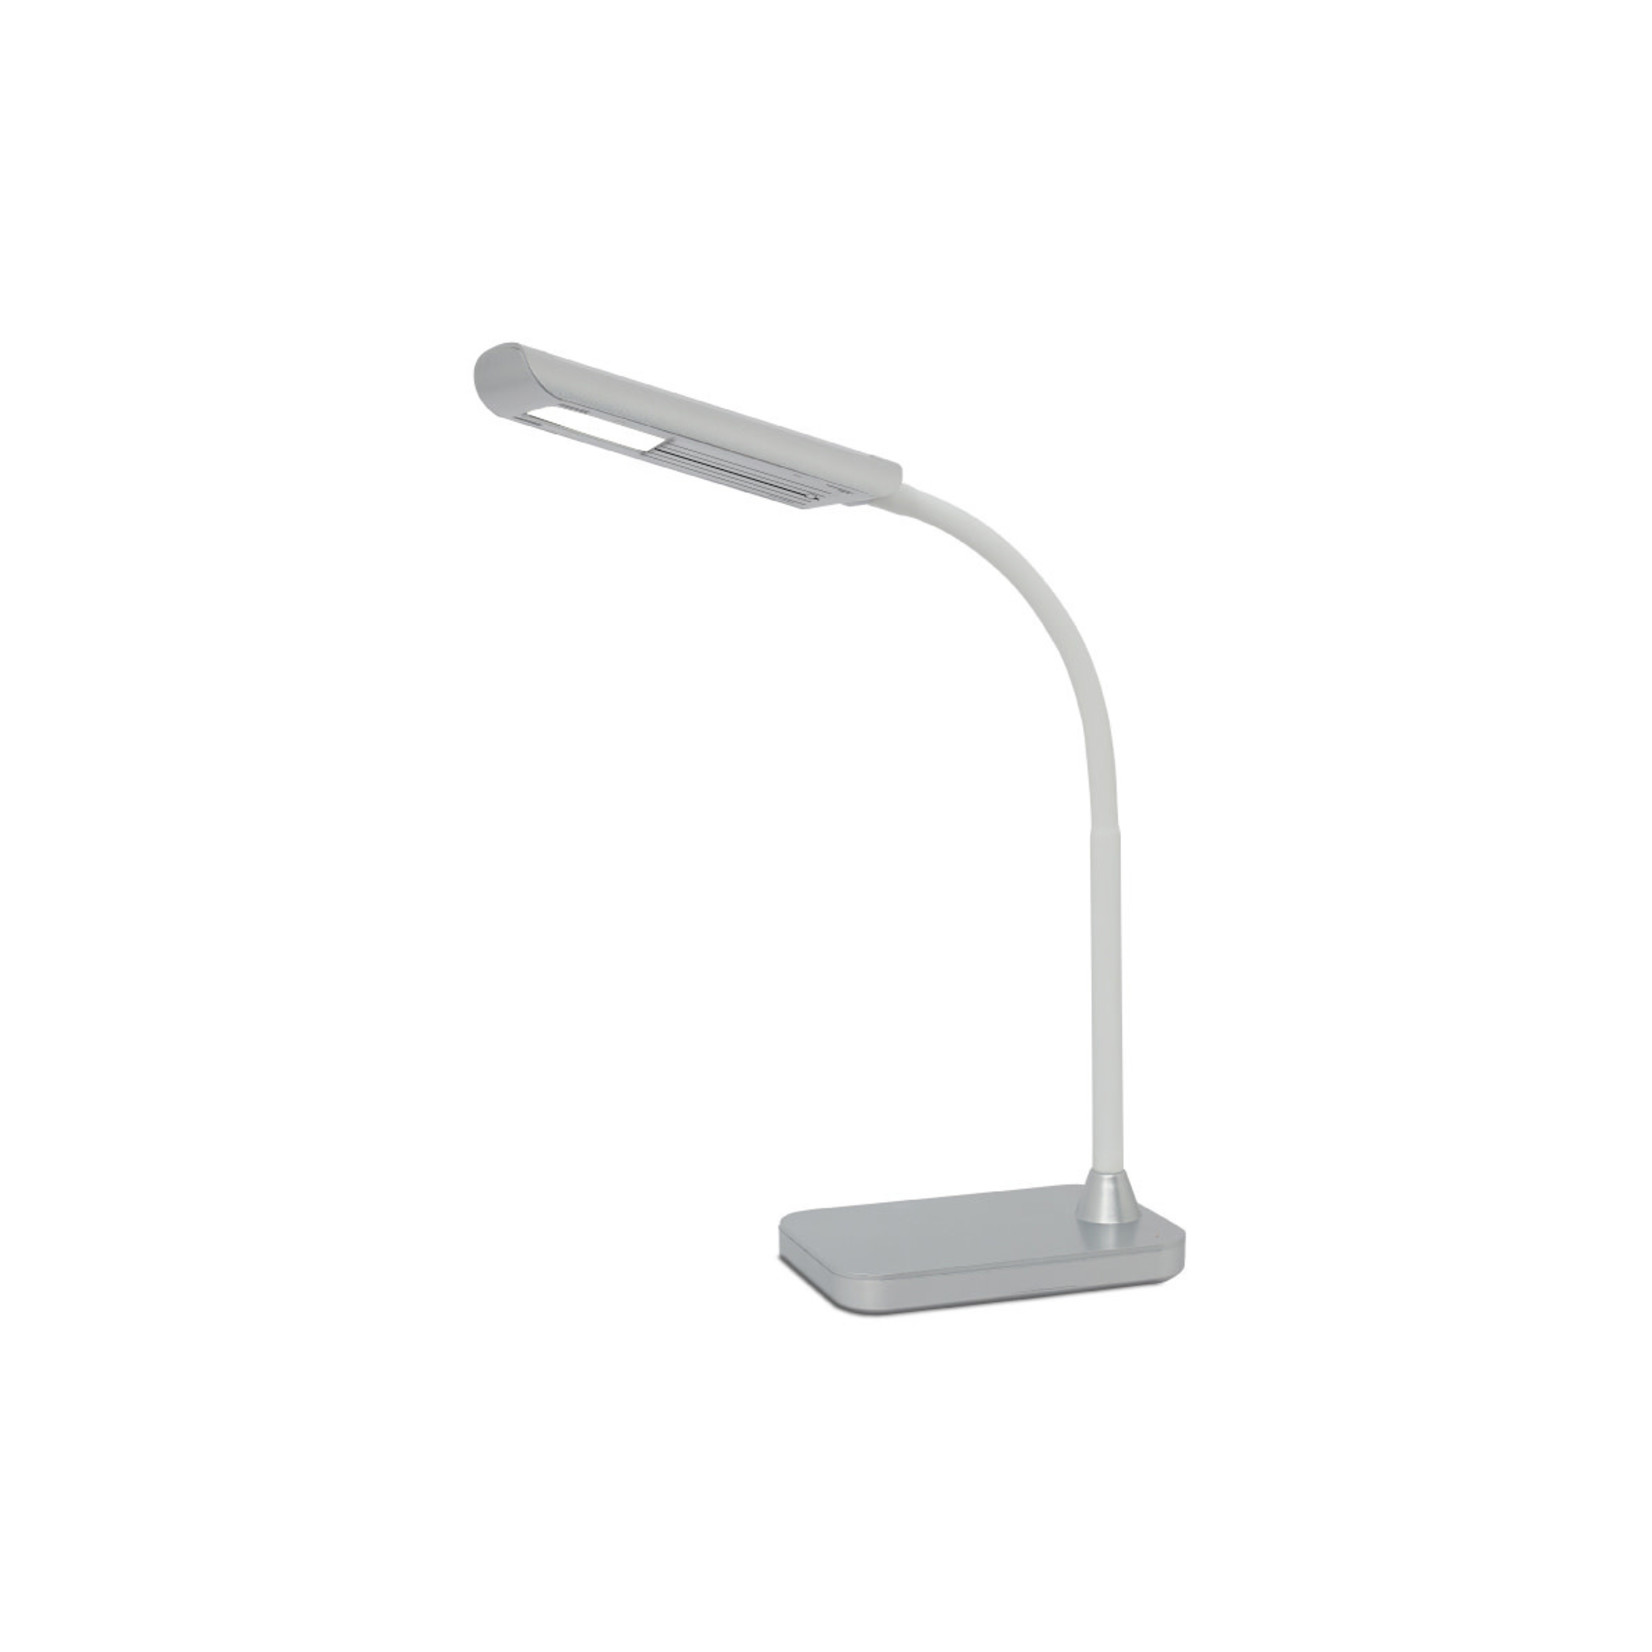 Shabbos Solution Or Li Shabbat Lamp - North American Model, Grey/Silver